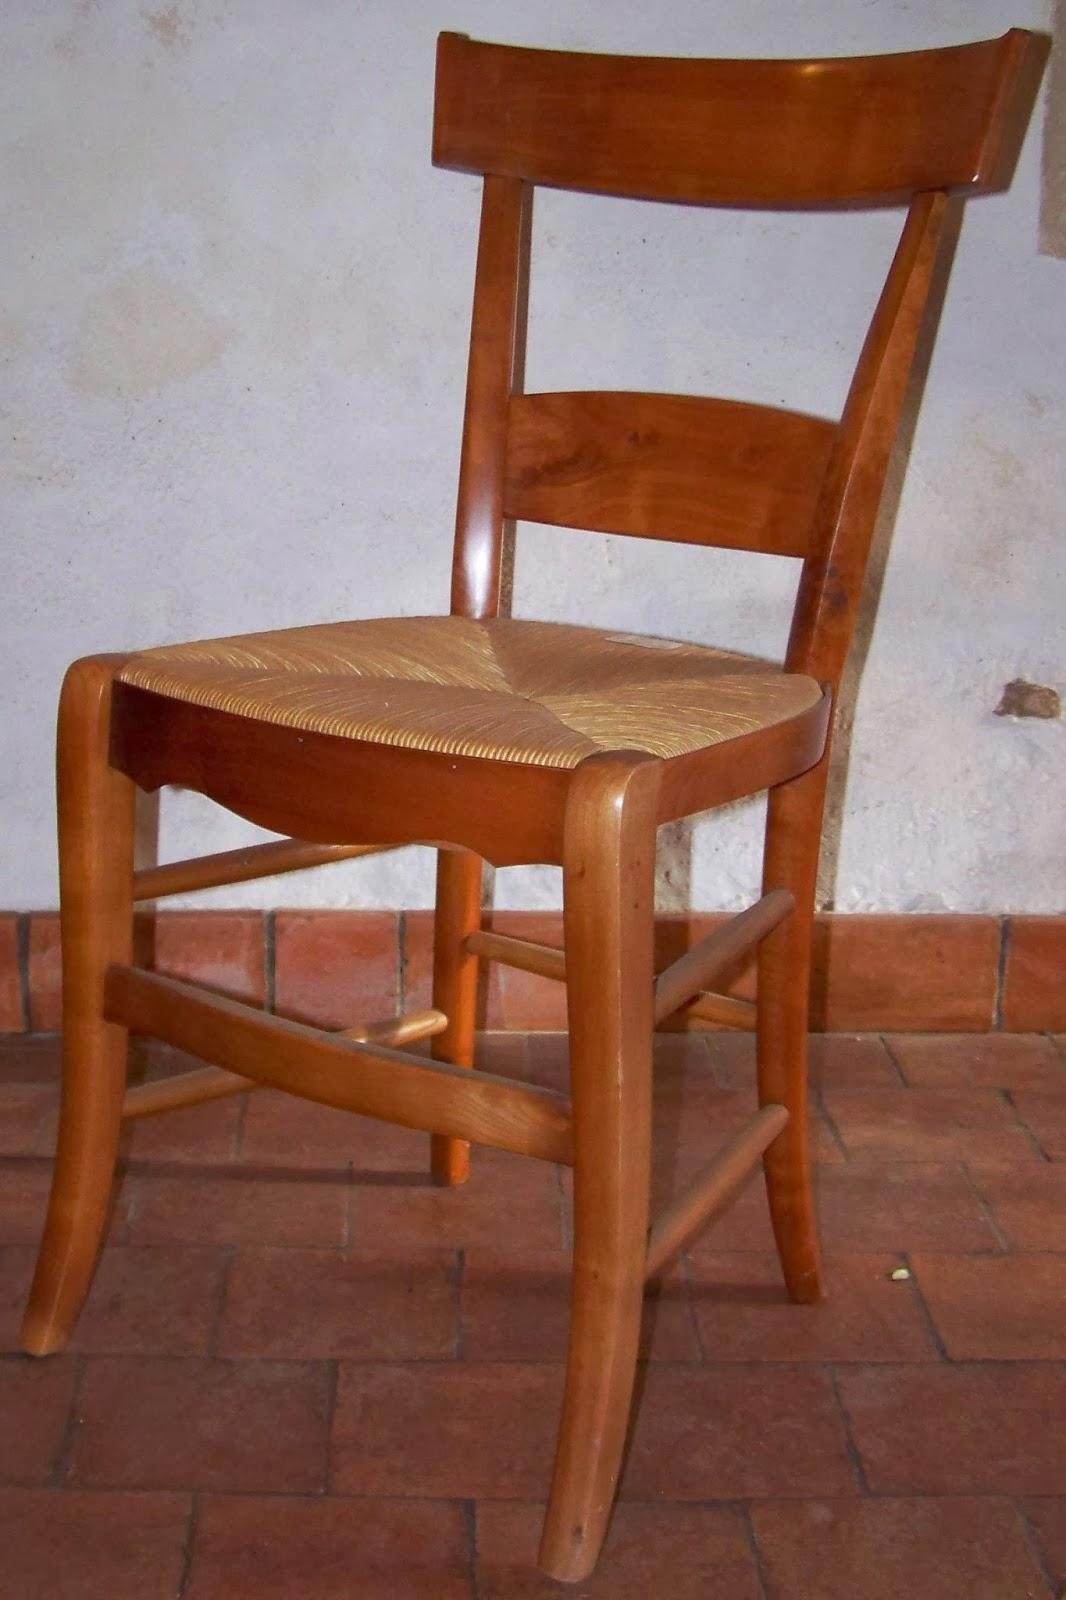 fabricant de chaises paill es meuble vitrine chene massif offres septembre clasf. Black Bedroom Furniture Sets. Home Design Ideas